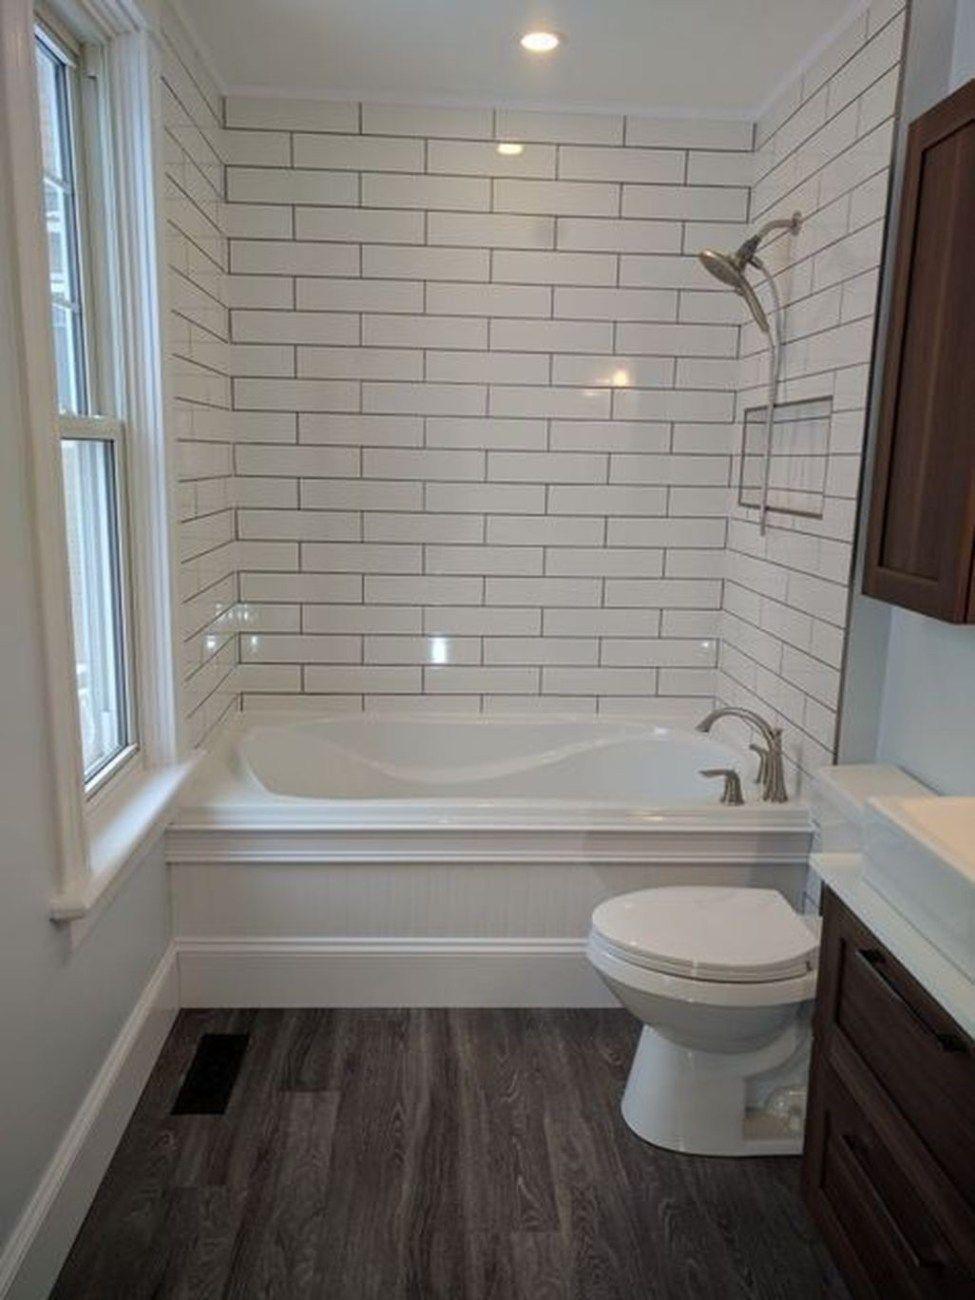 47 stunning small bathroom remodel inspiration ideas on stunning small bathroom design ideas id=43366